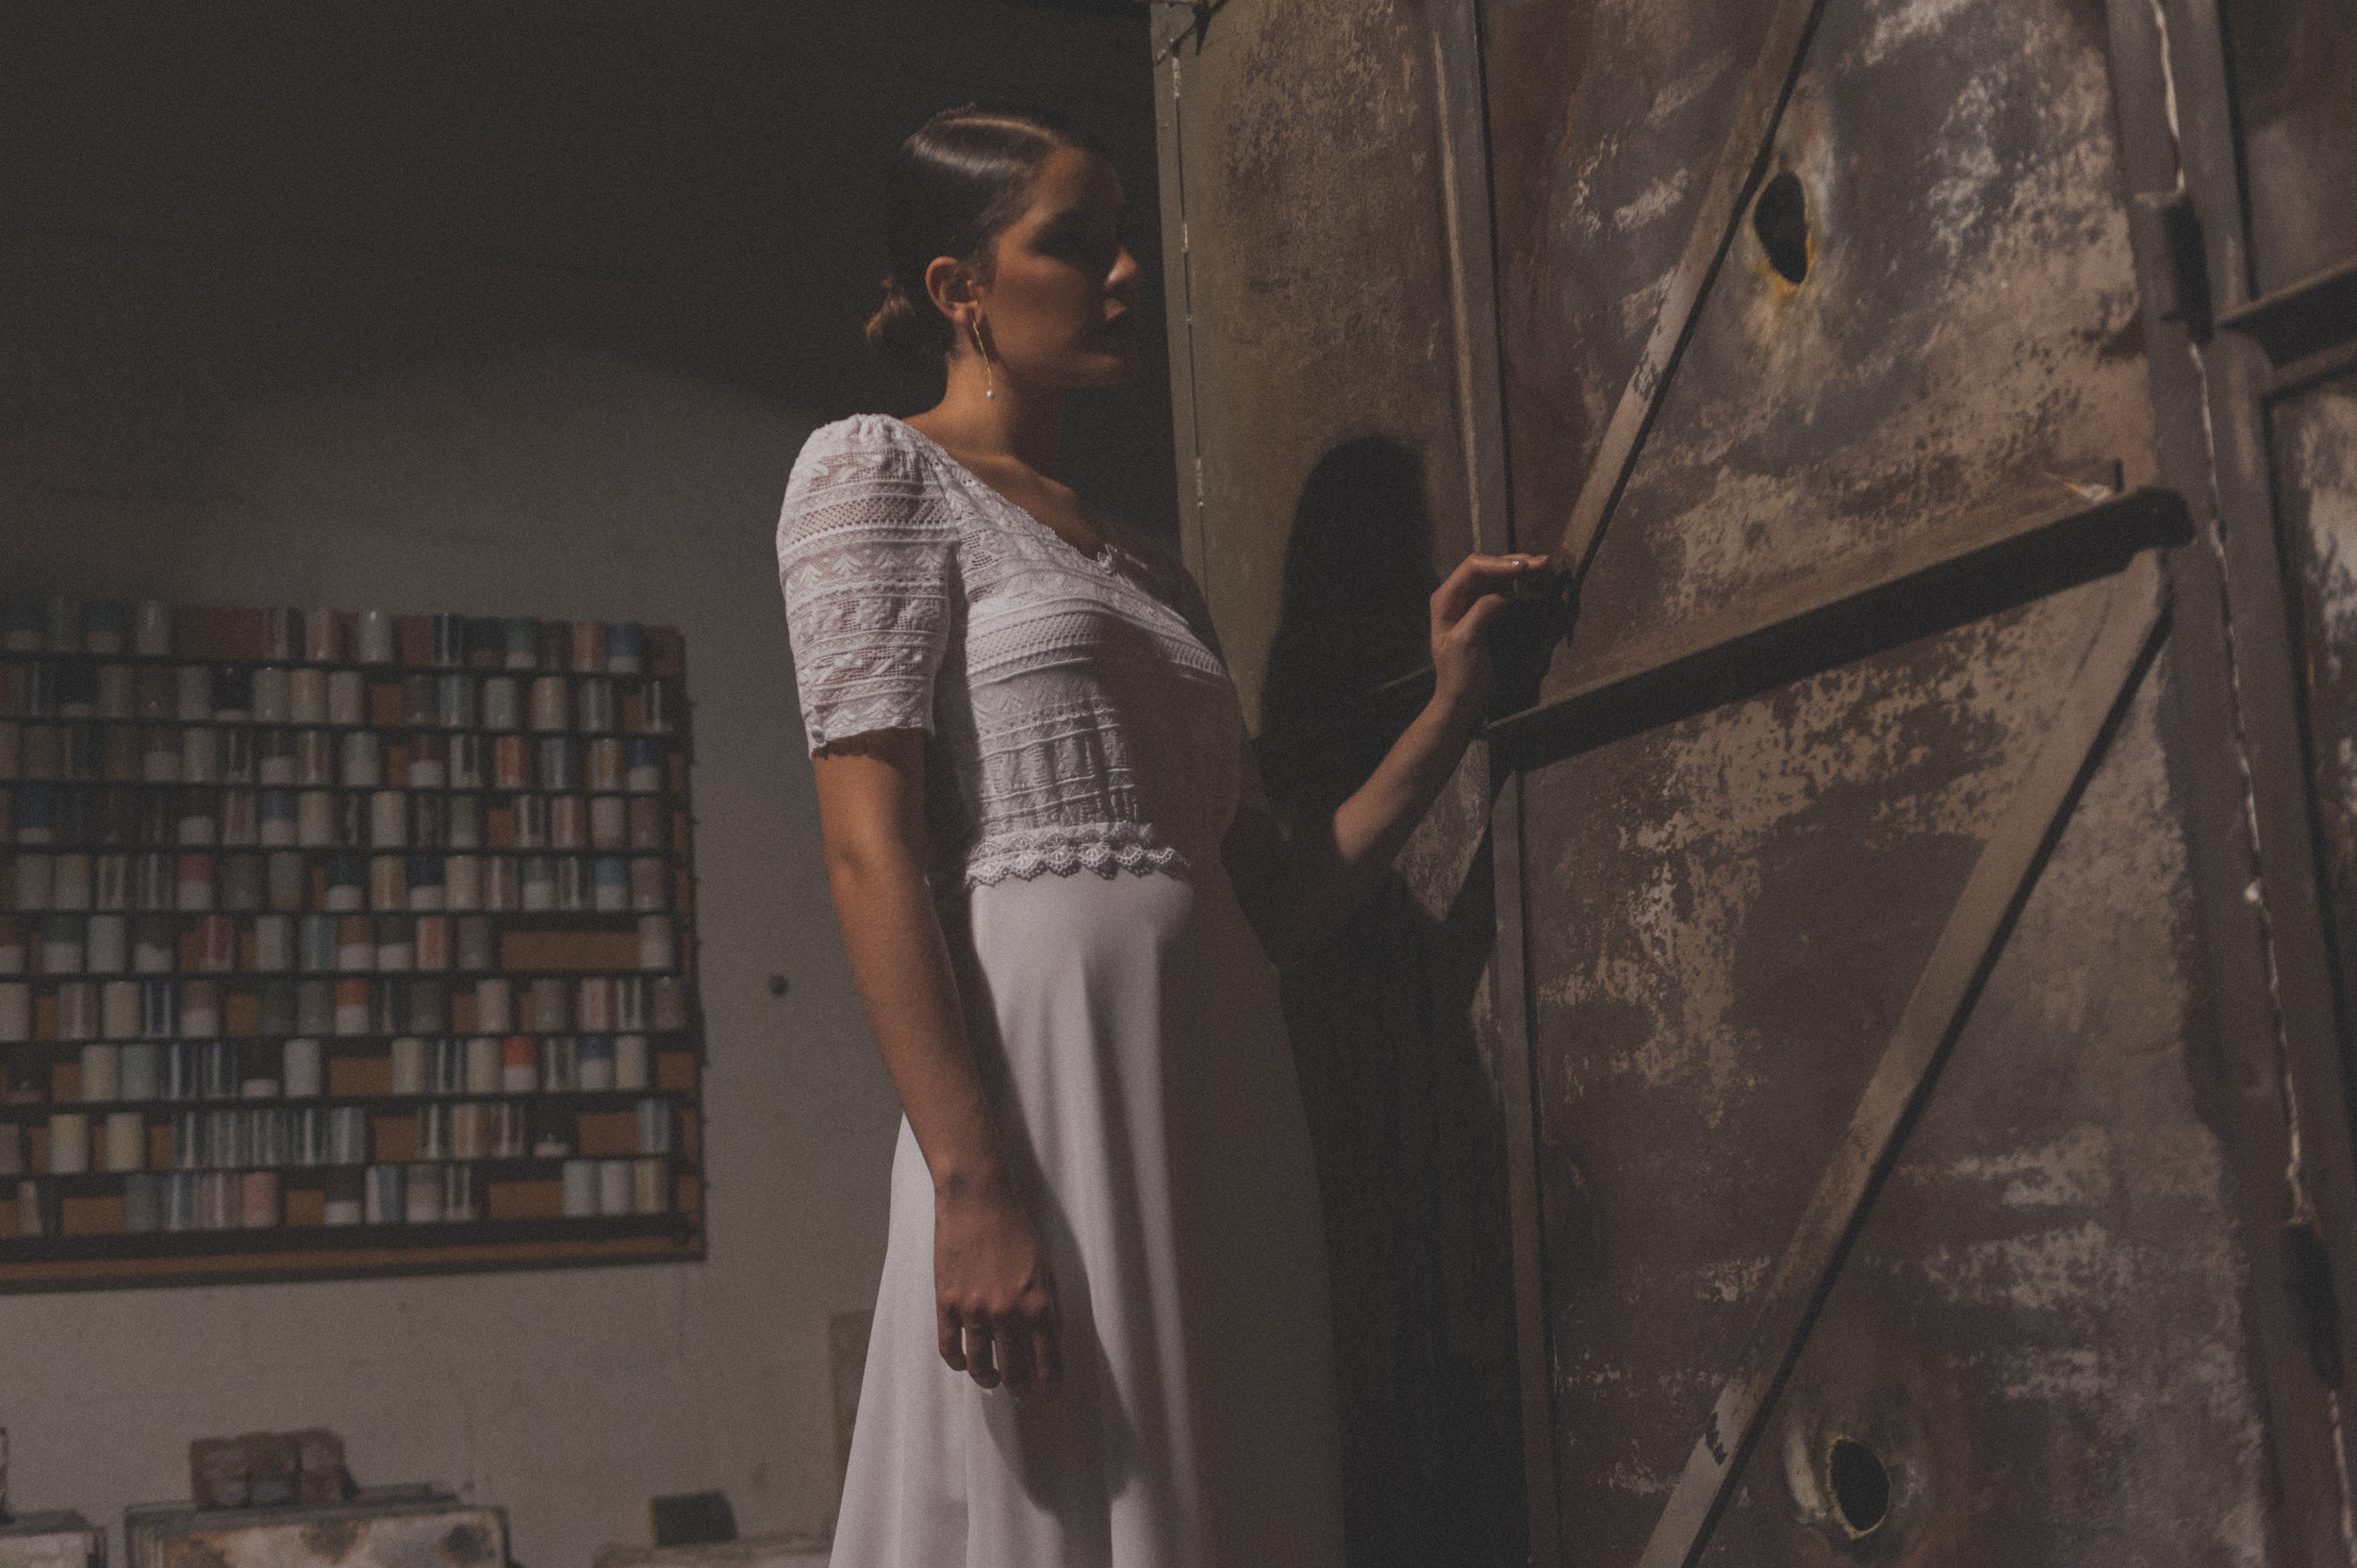 Vestido Paul . L'Appartement Atelier . made in BH . Made in Brazil . Vestido de Noiva BH . Locação Soalheiro Atelier . Foto Kika Antunes . Make Indianara Araujo